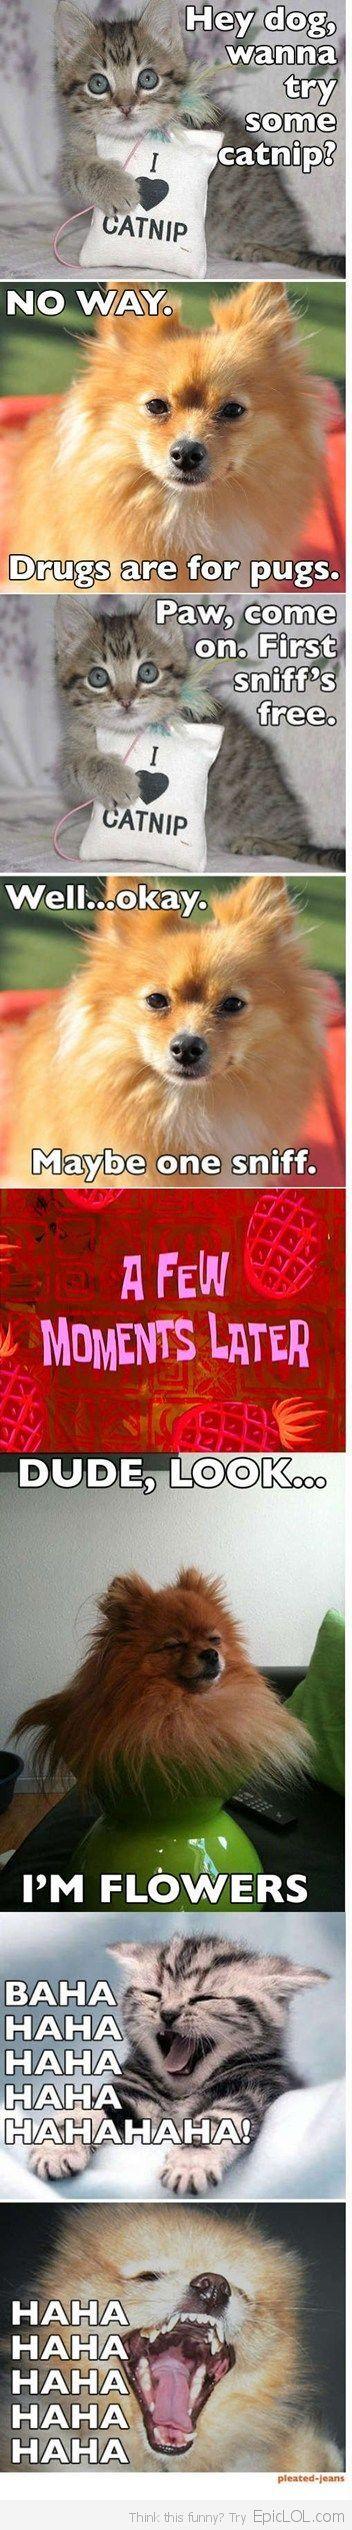 Dude, I'm flowers | made me chuckle!  See More:    http://wdb.es/?utm_campaign=wdb.es&utm_medium=pinterest&utm_source=pinterst-description&utm_content=&utm_term=